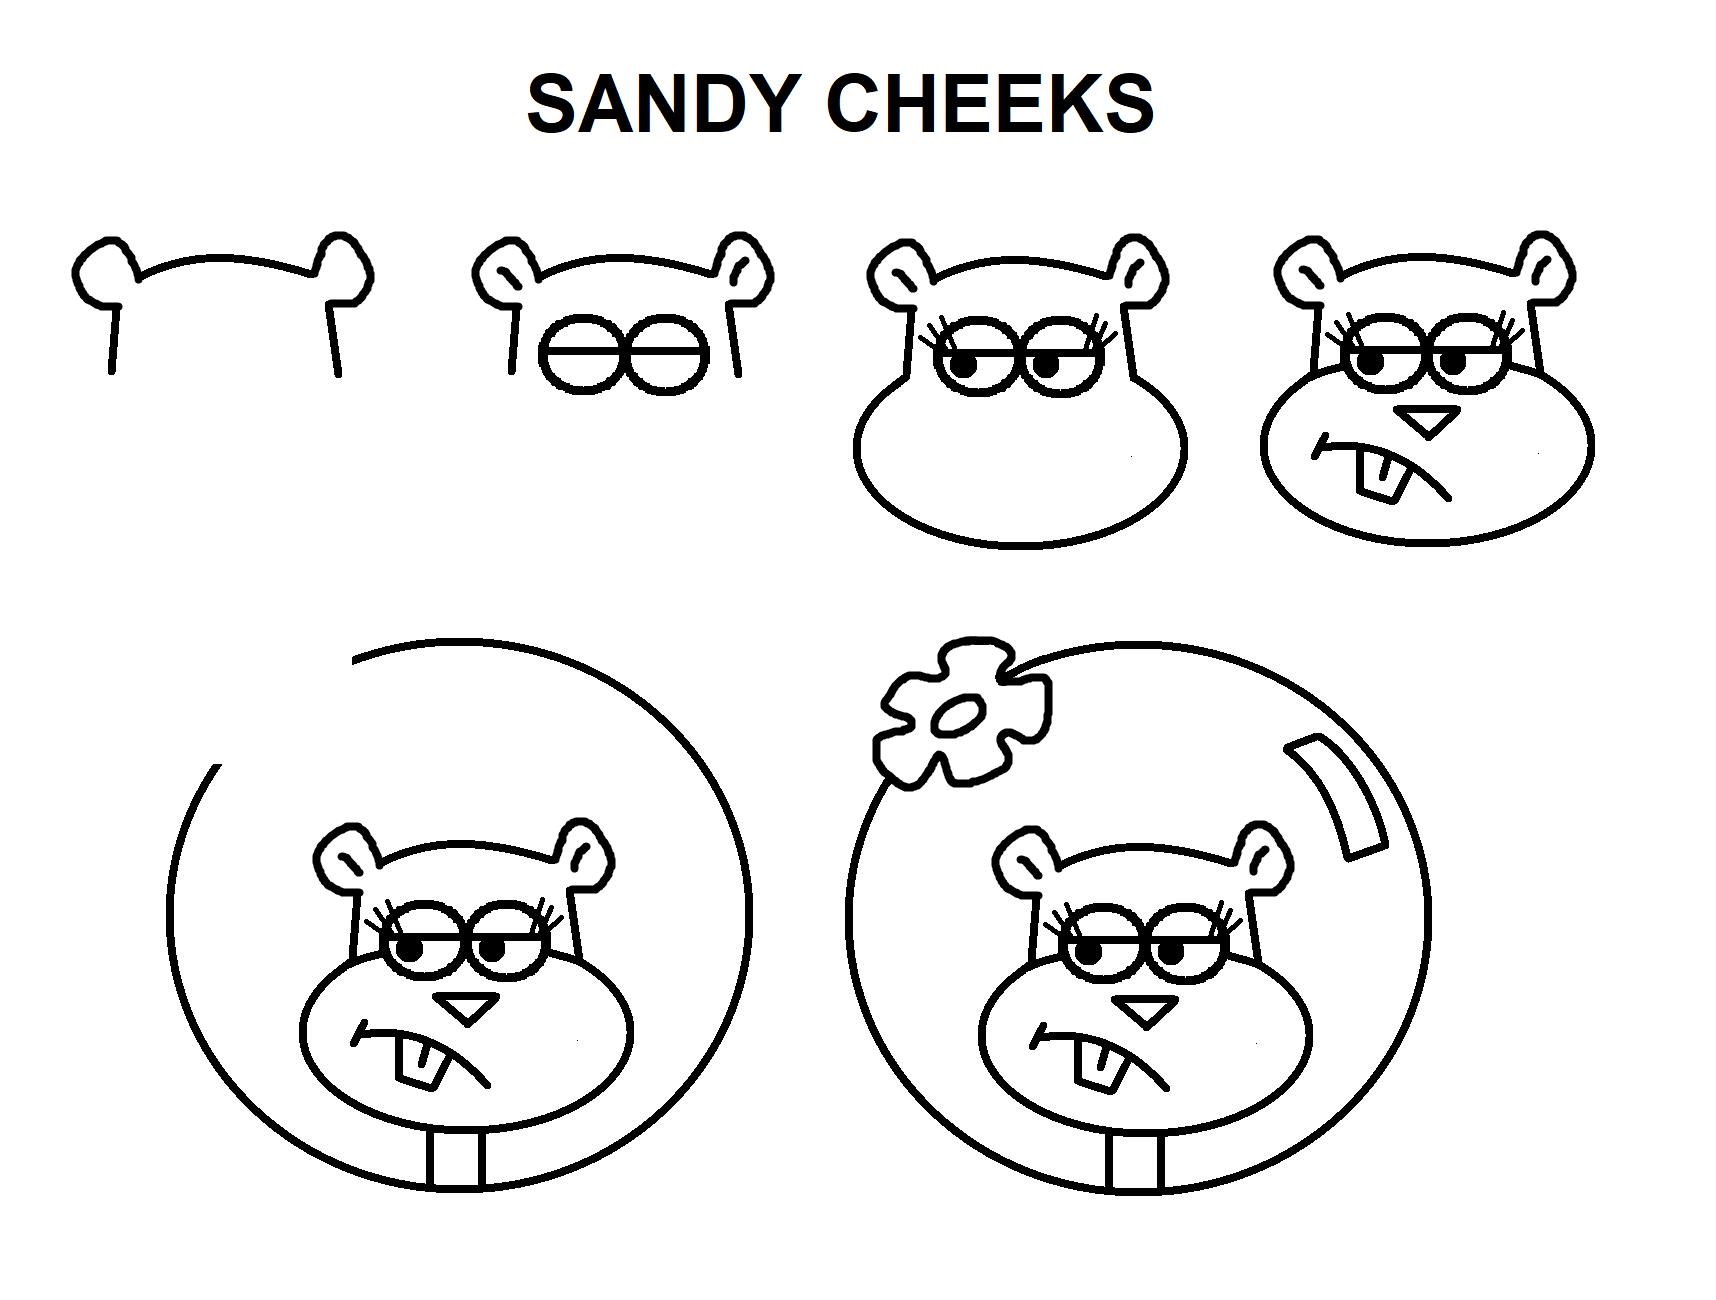 - Step-by-step Tutorial To Draw Sandy Cheeks. Sandy Cheeks